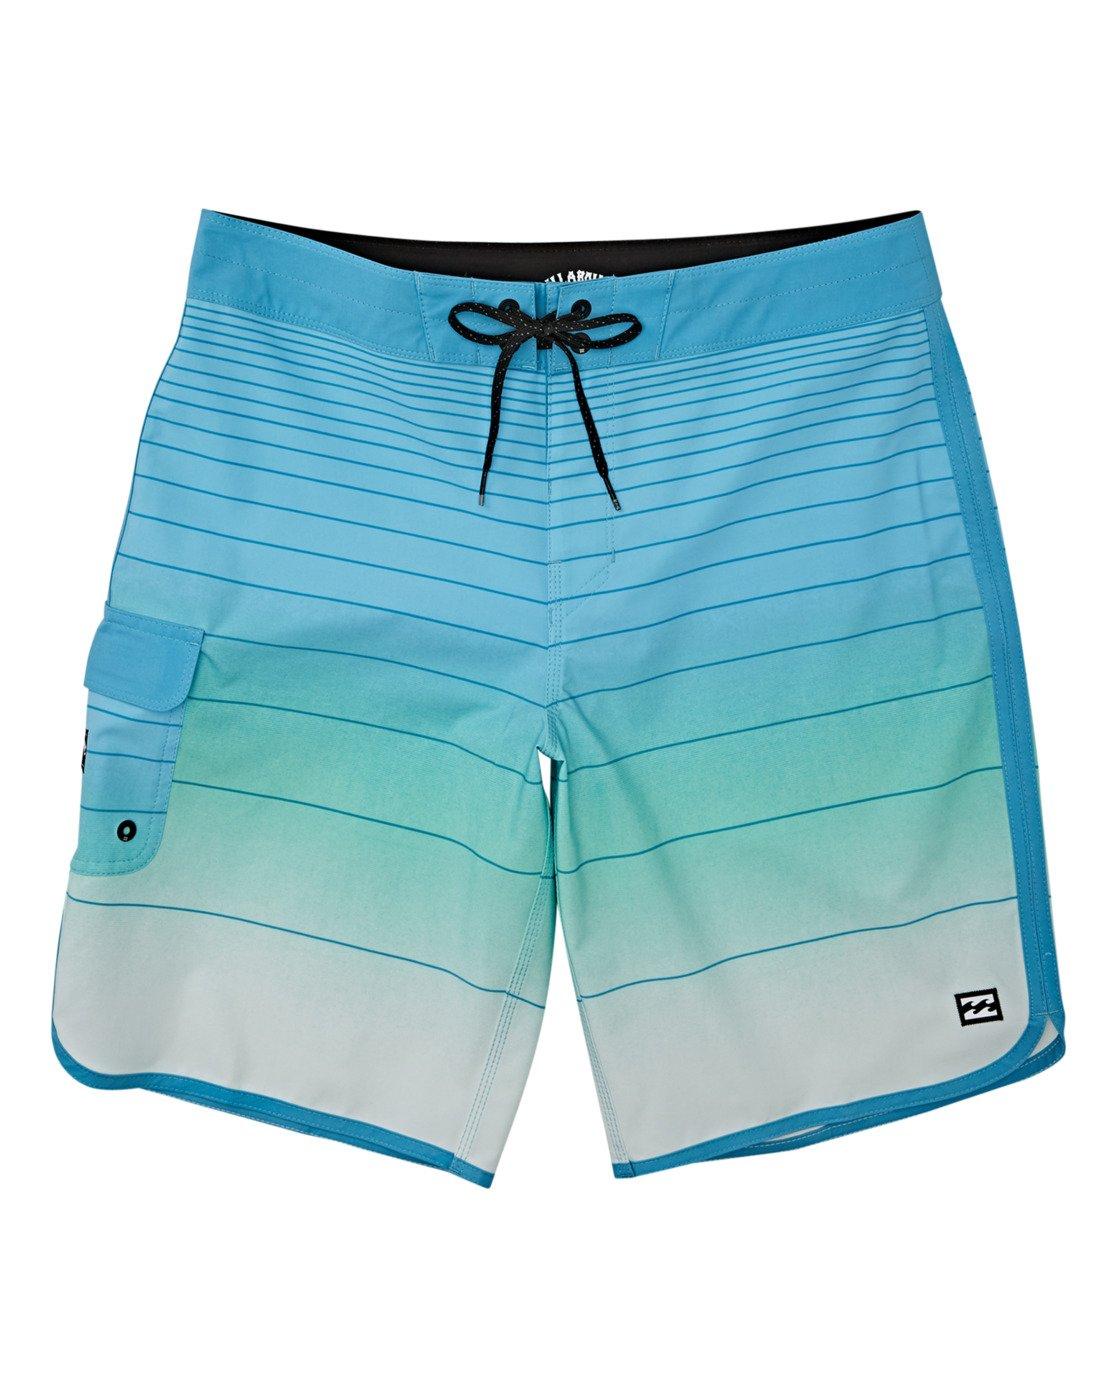 Billabong Boys 73 Line Up Pro Boardshorts Blue 27